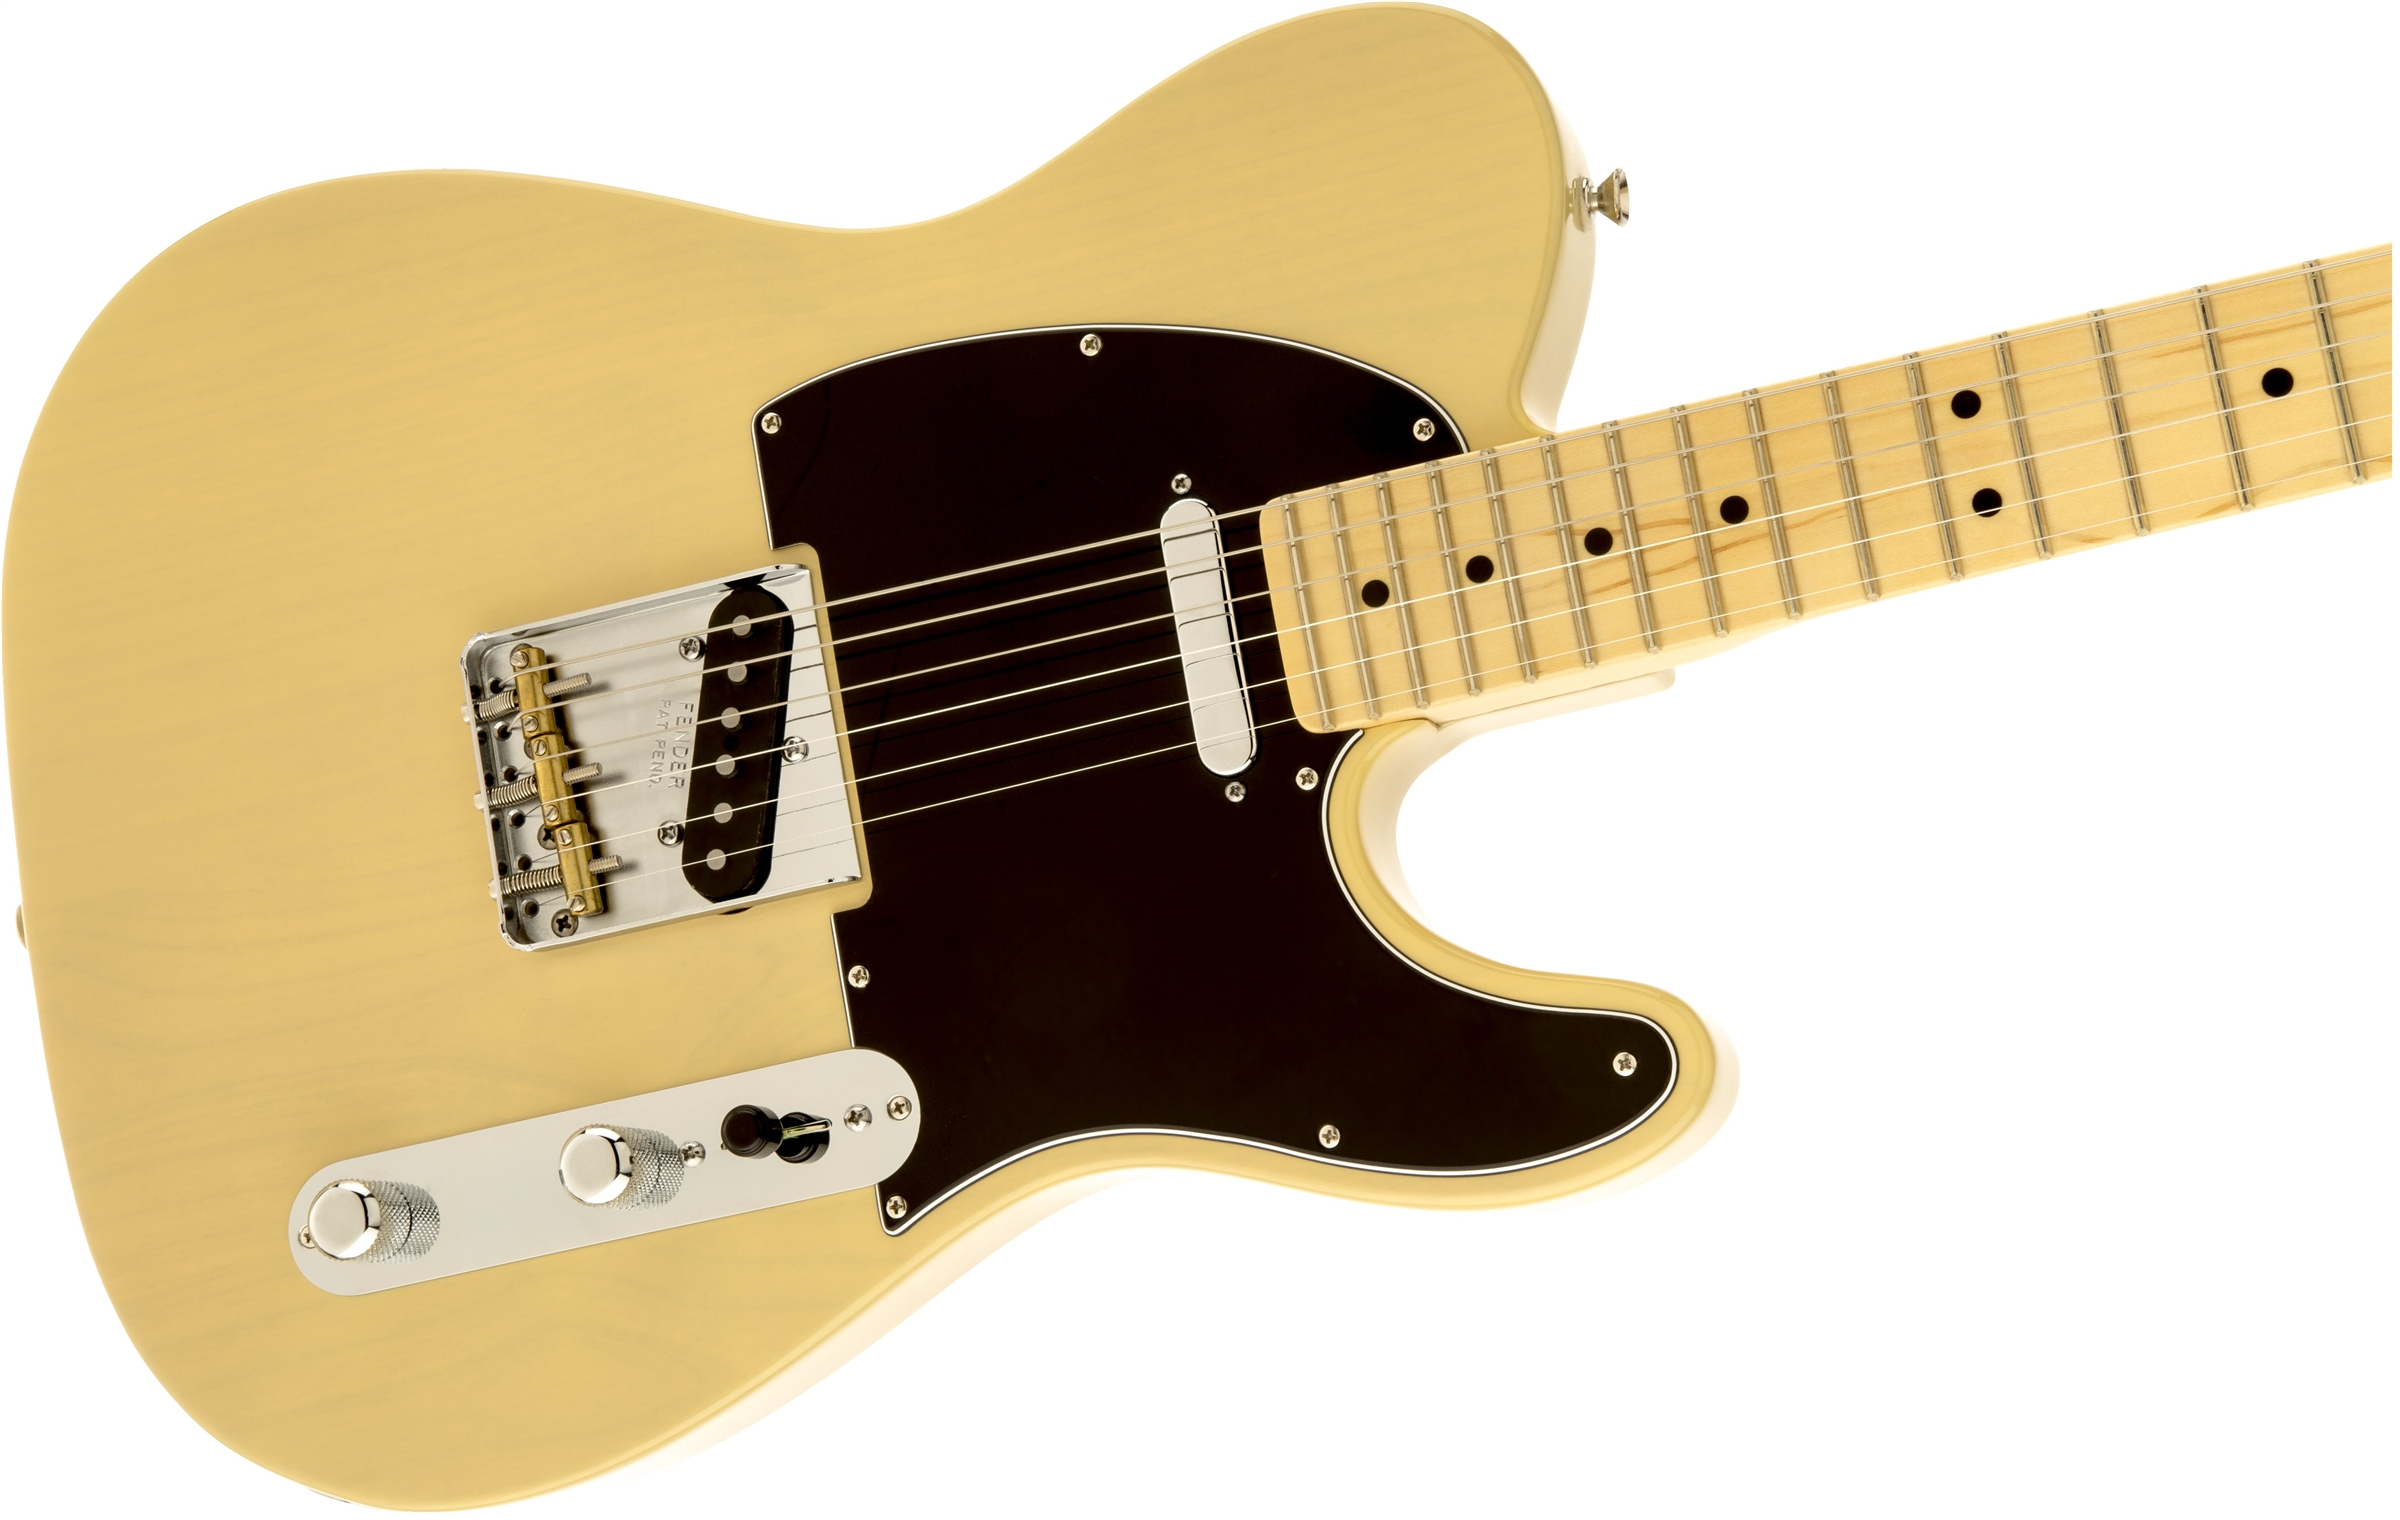 american special telecaster electric guitars. Black Bedroom Furniture Sets. Home Design Ideas